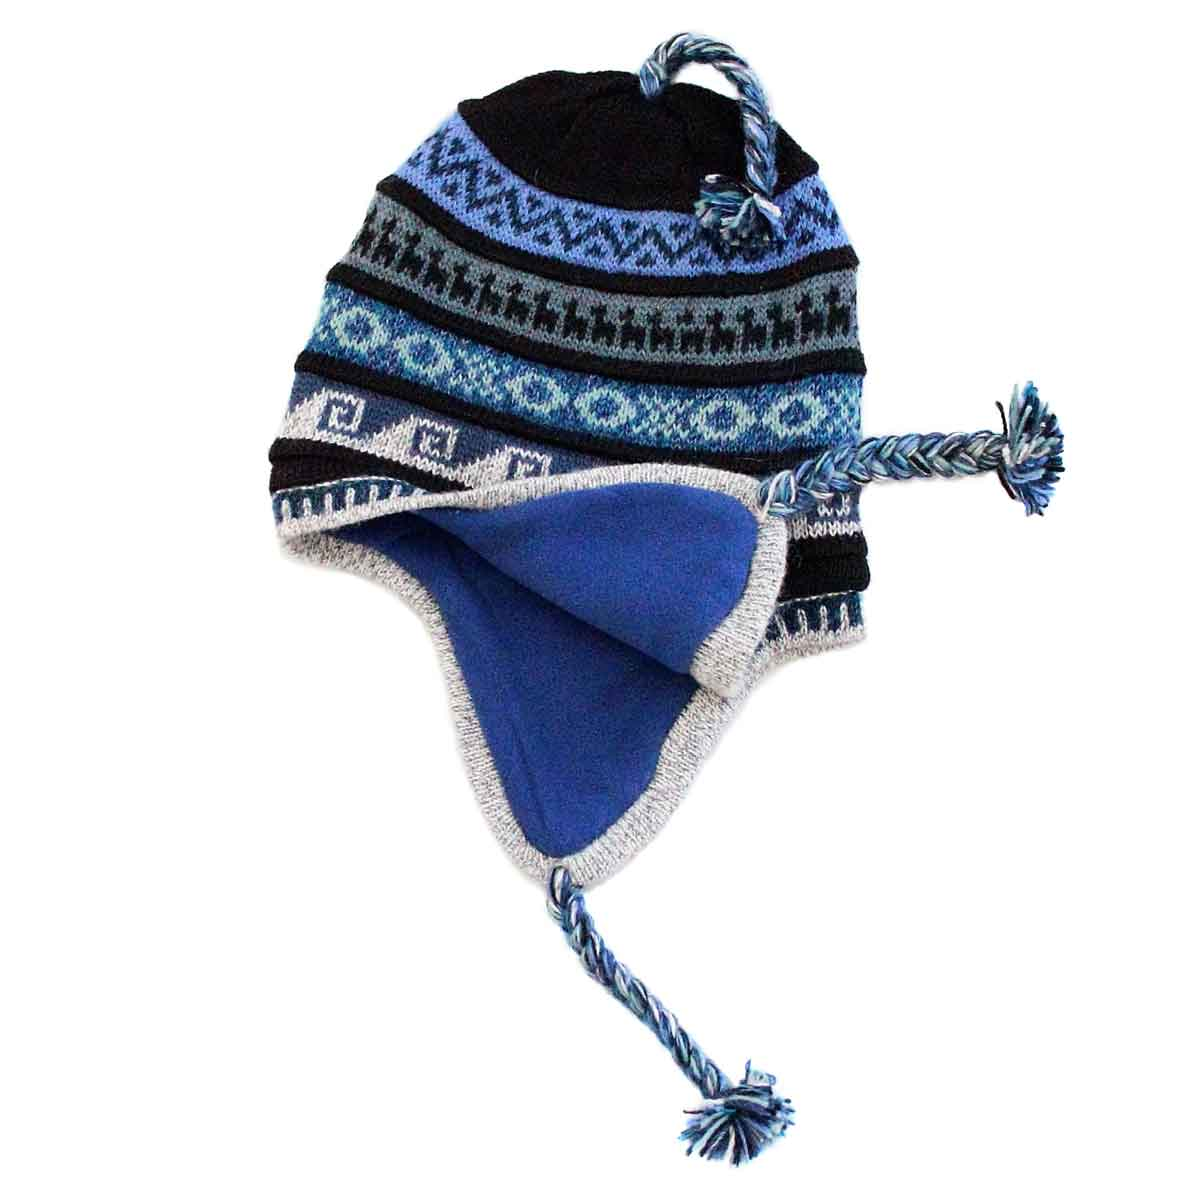 Inka-Products-Bonnet Péruvien Chullo-Alpaga Bleu Ethnique-2